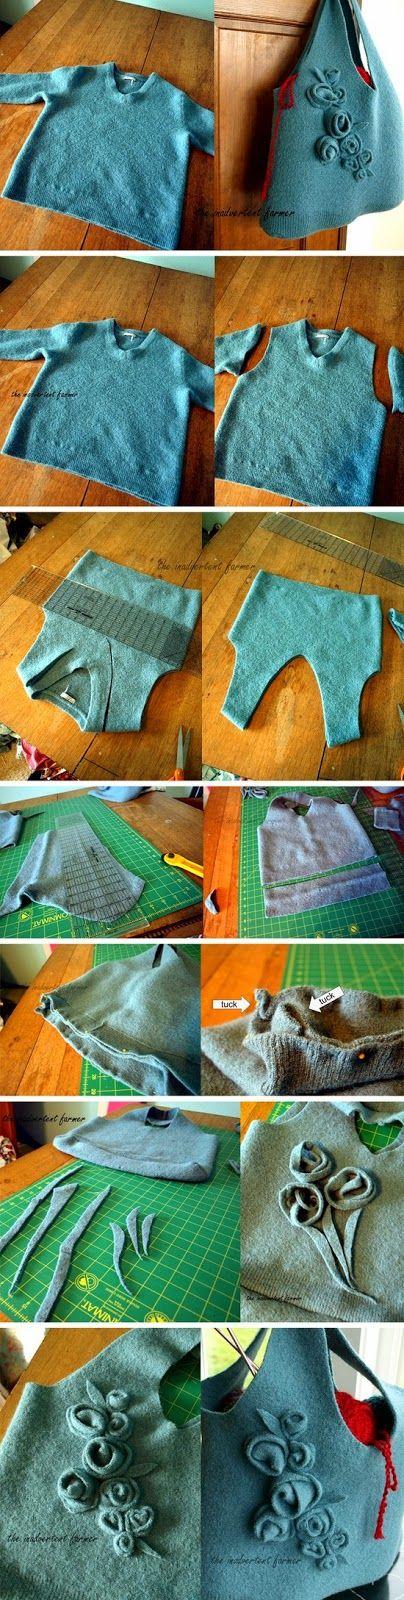 Turn sweater into purse